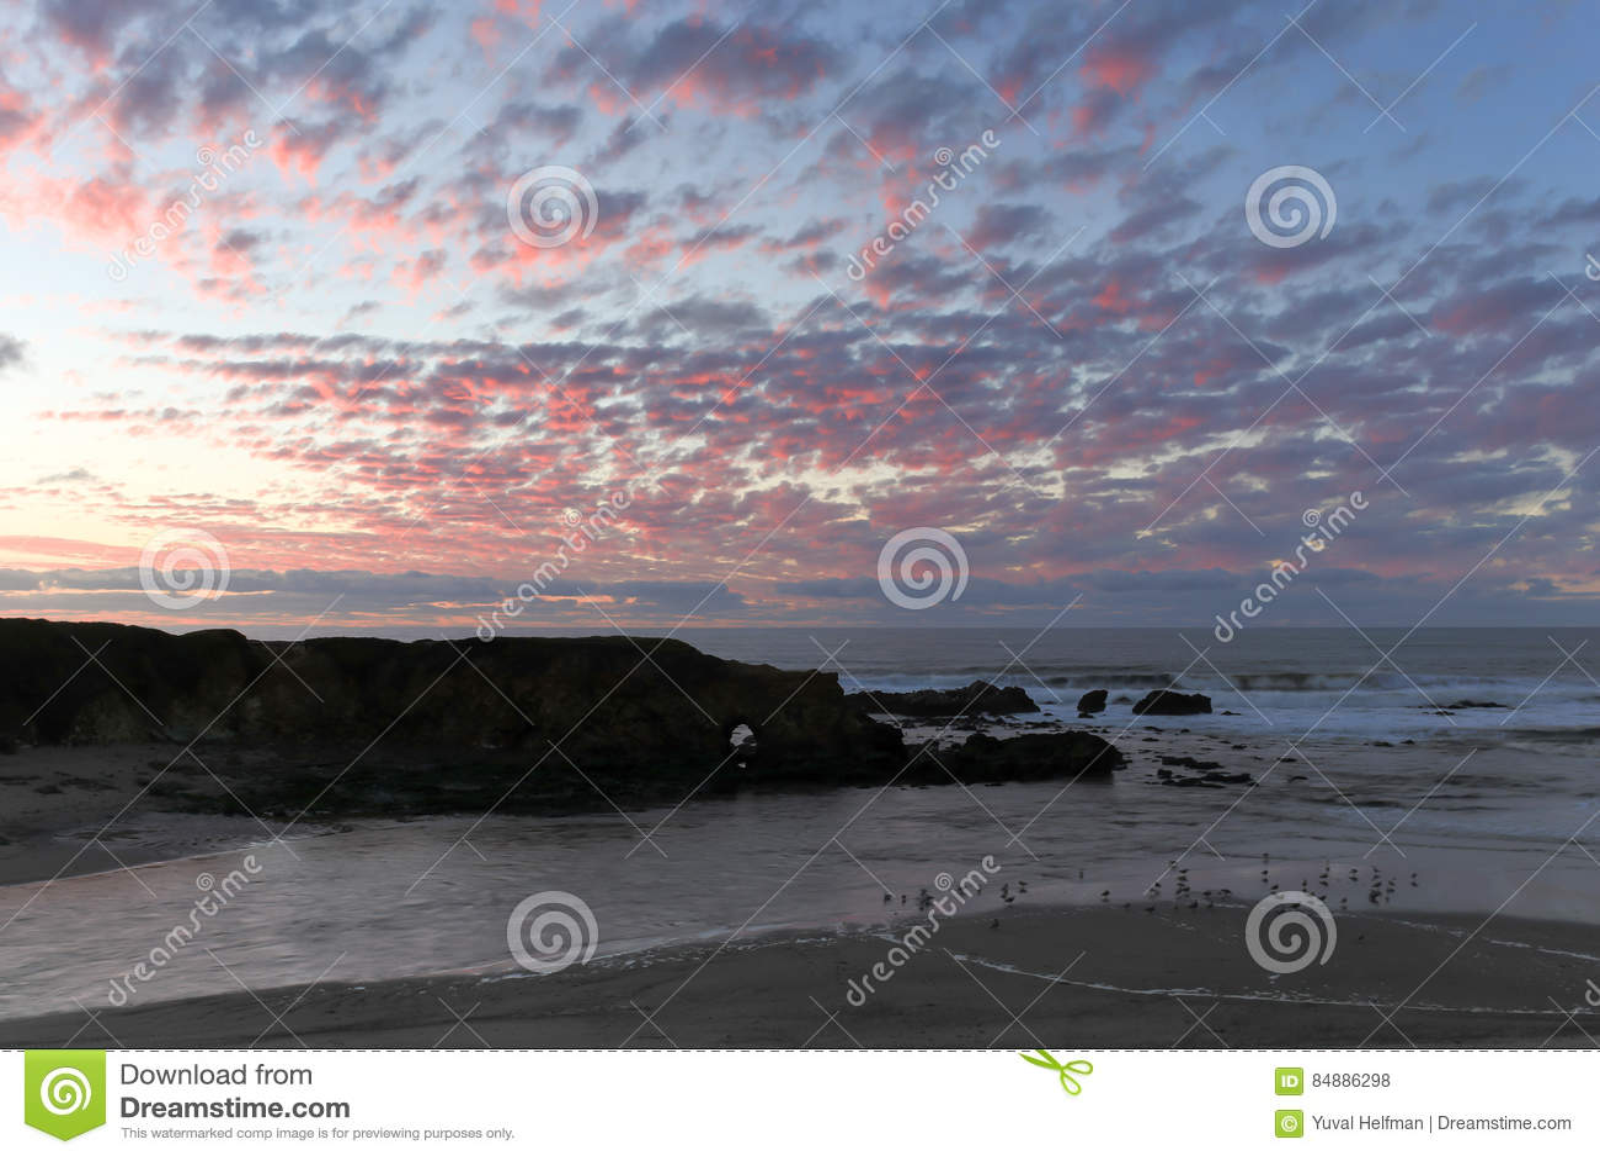 California san mateo county pescadero - Beach California Mateo Pescadero San